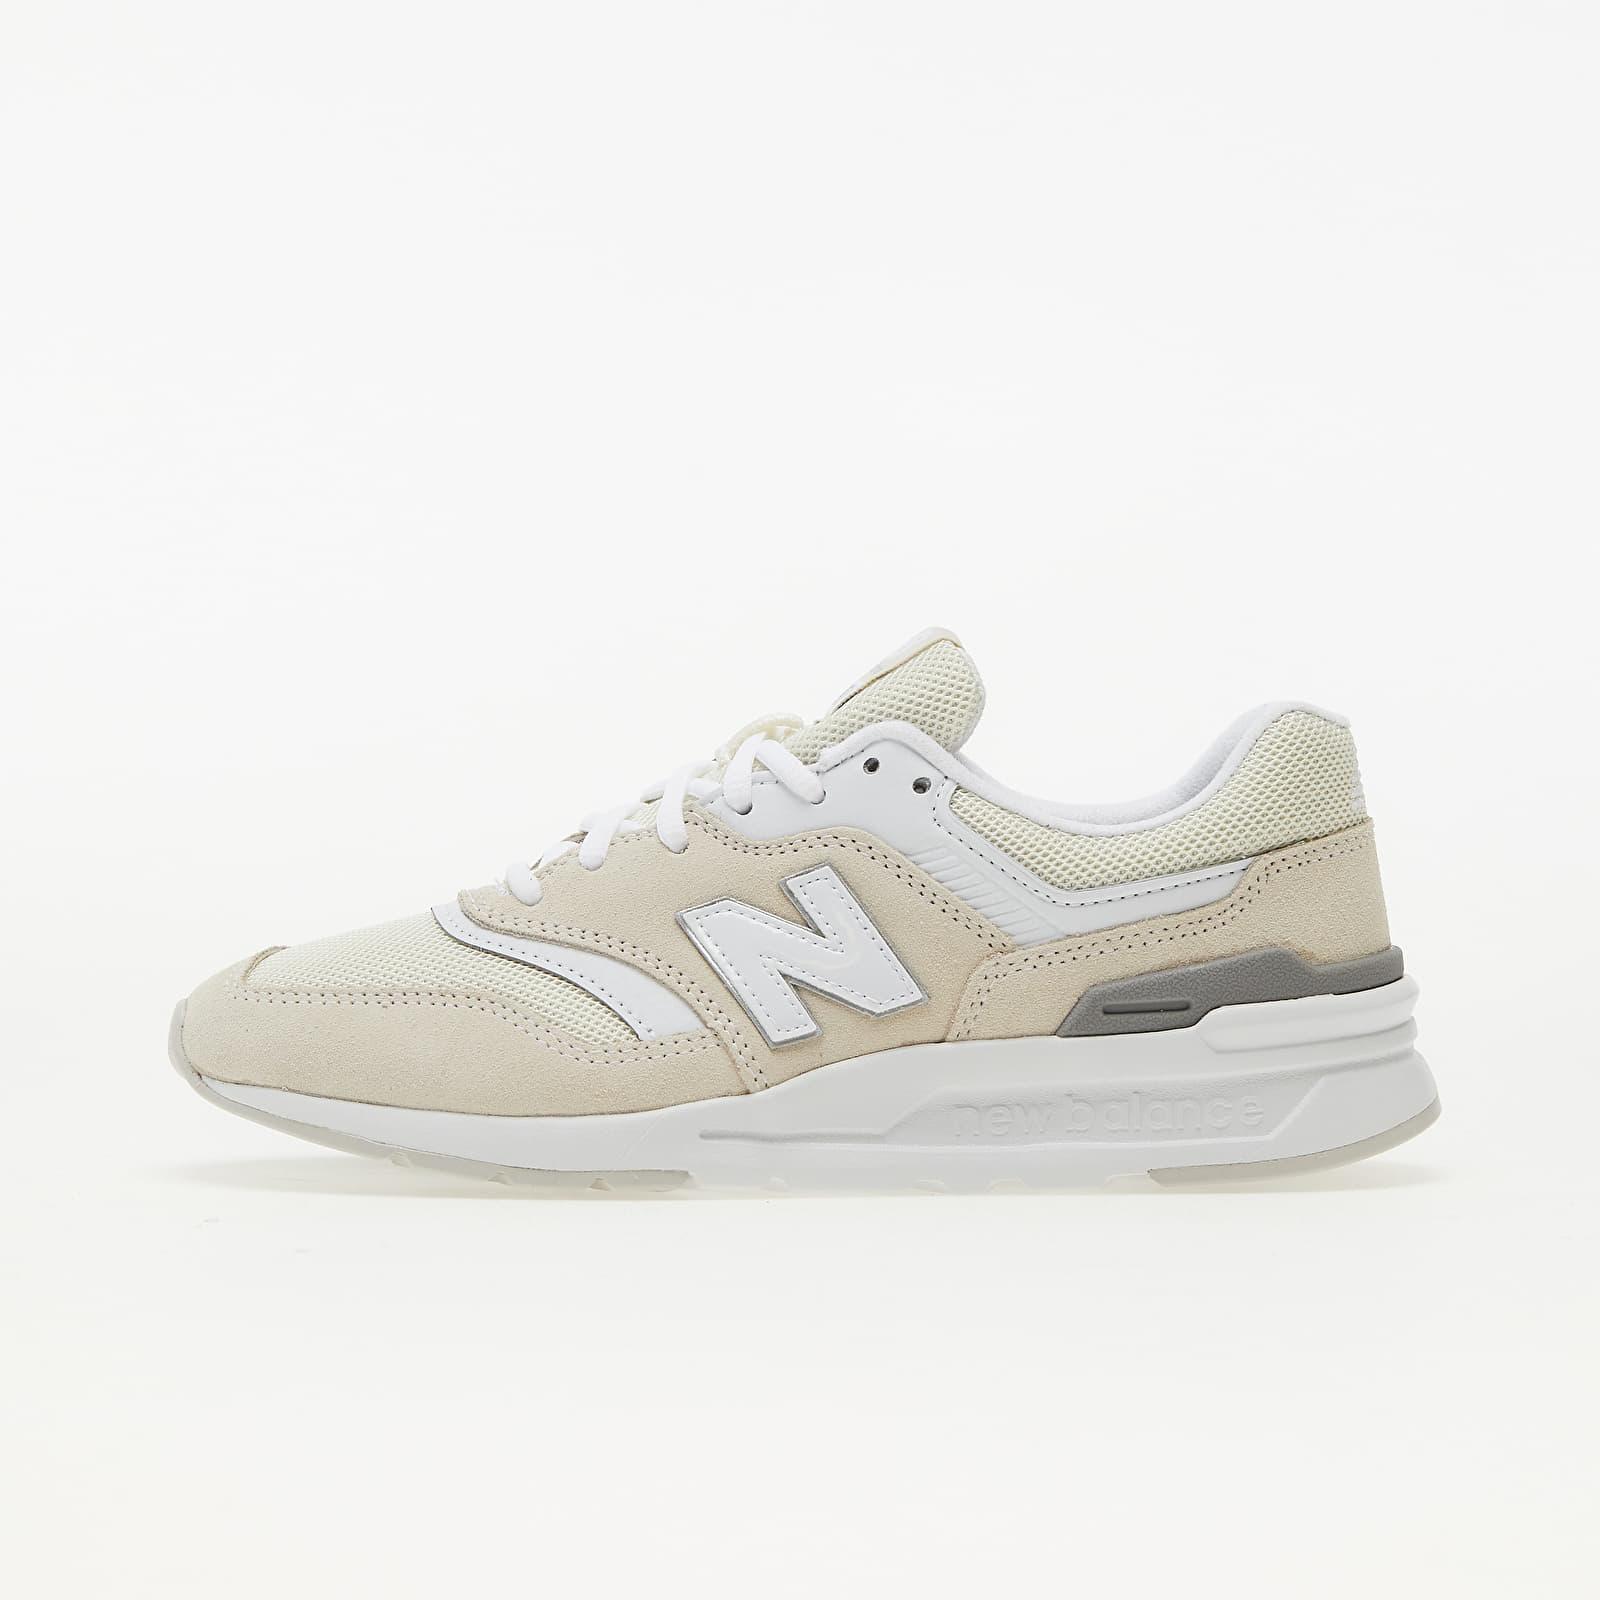 New Balance 997 Beige CW997HCO